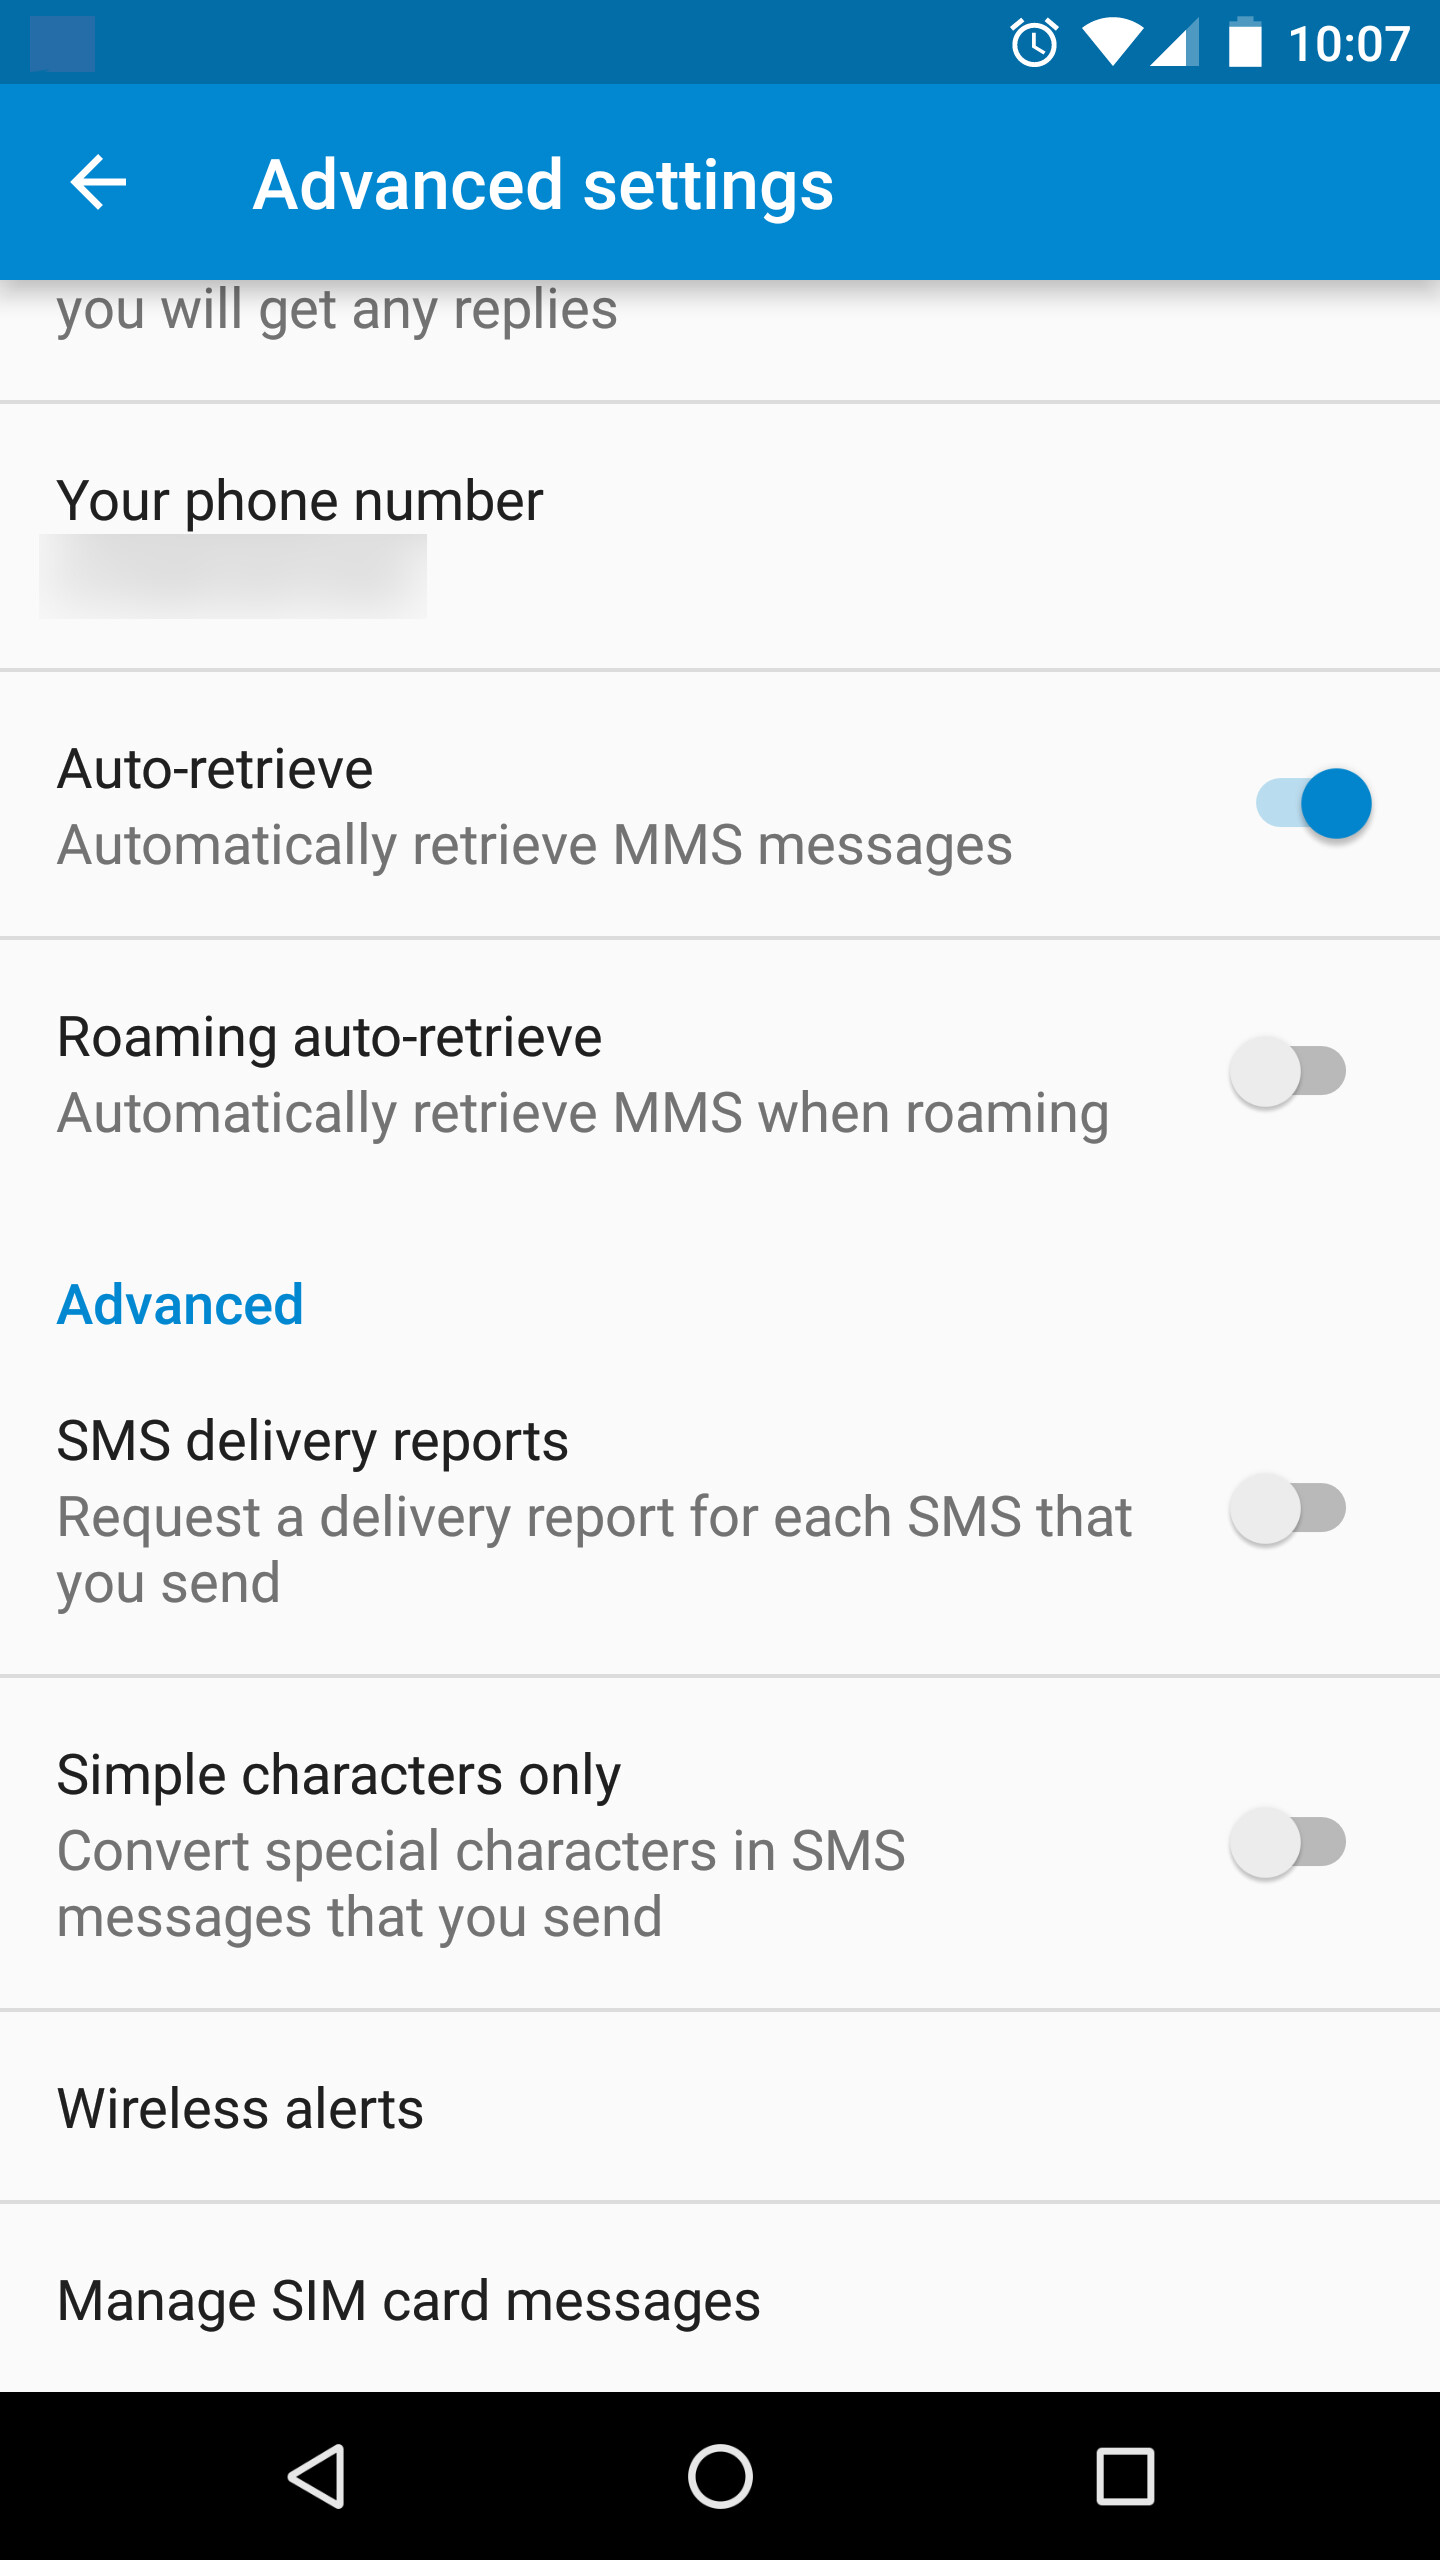 Google Messenger adding SIM card message manager - PhoneArena